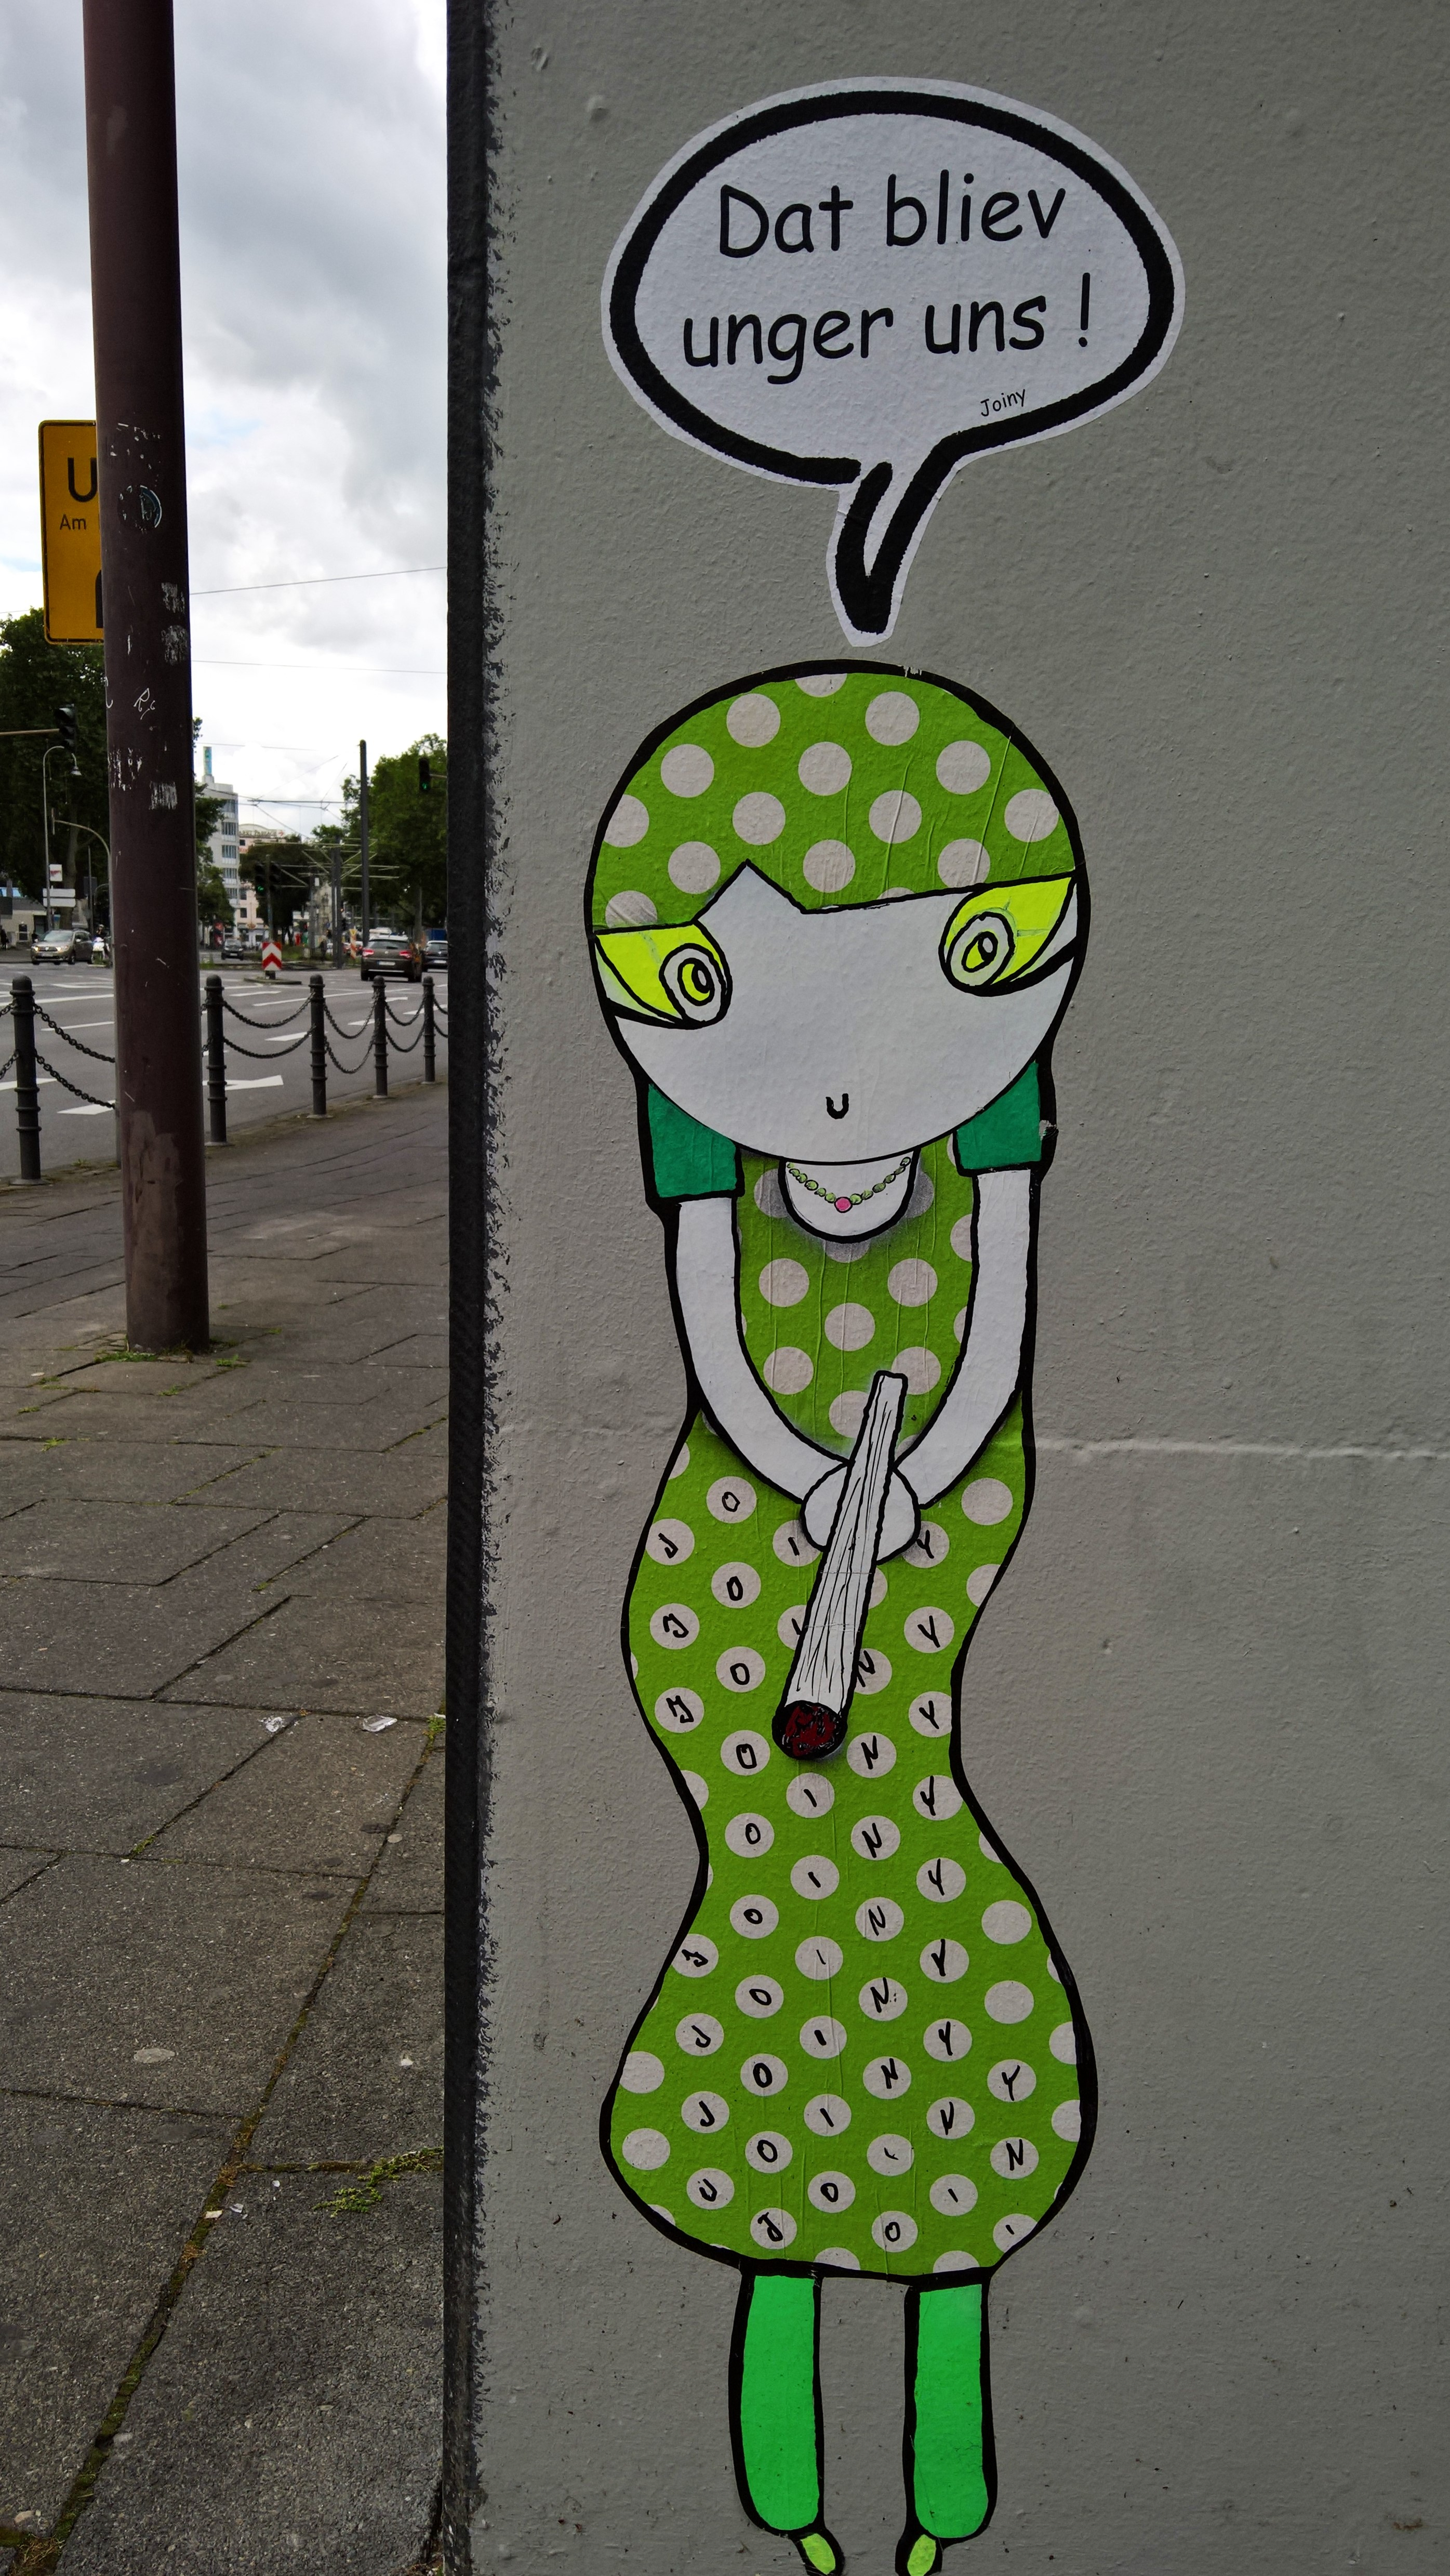 dat-bliev-unger-uns-streetart-koeln